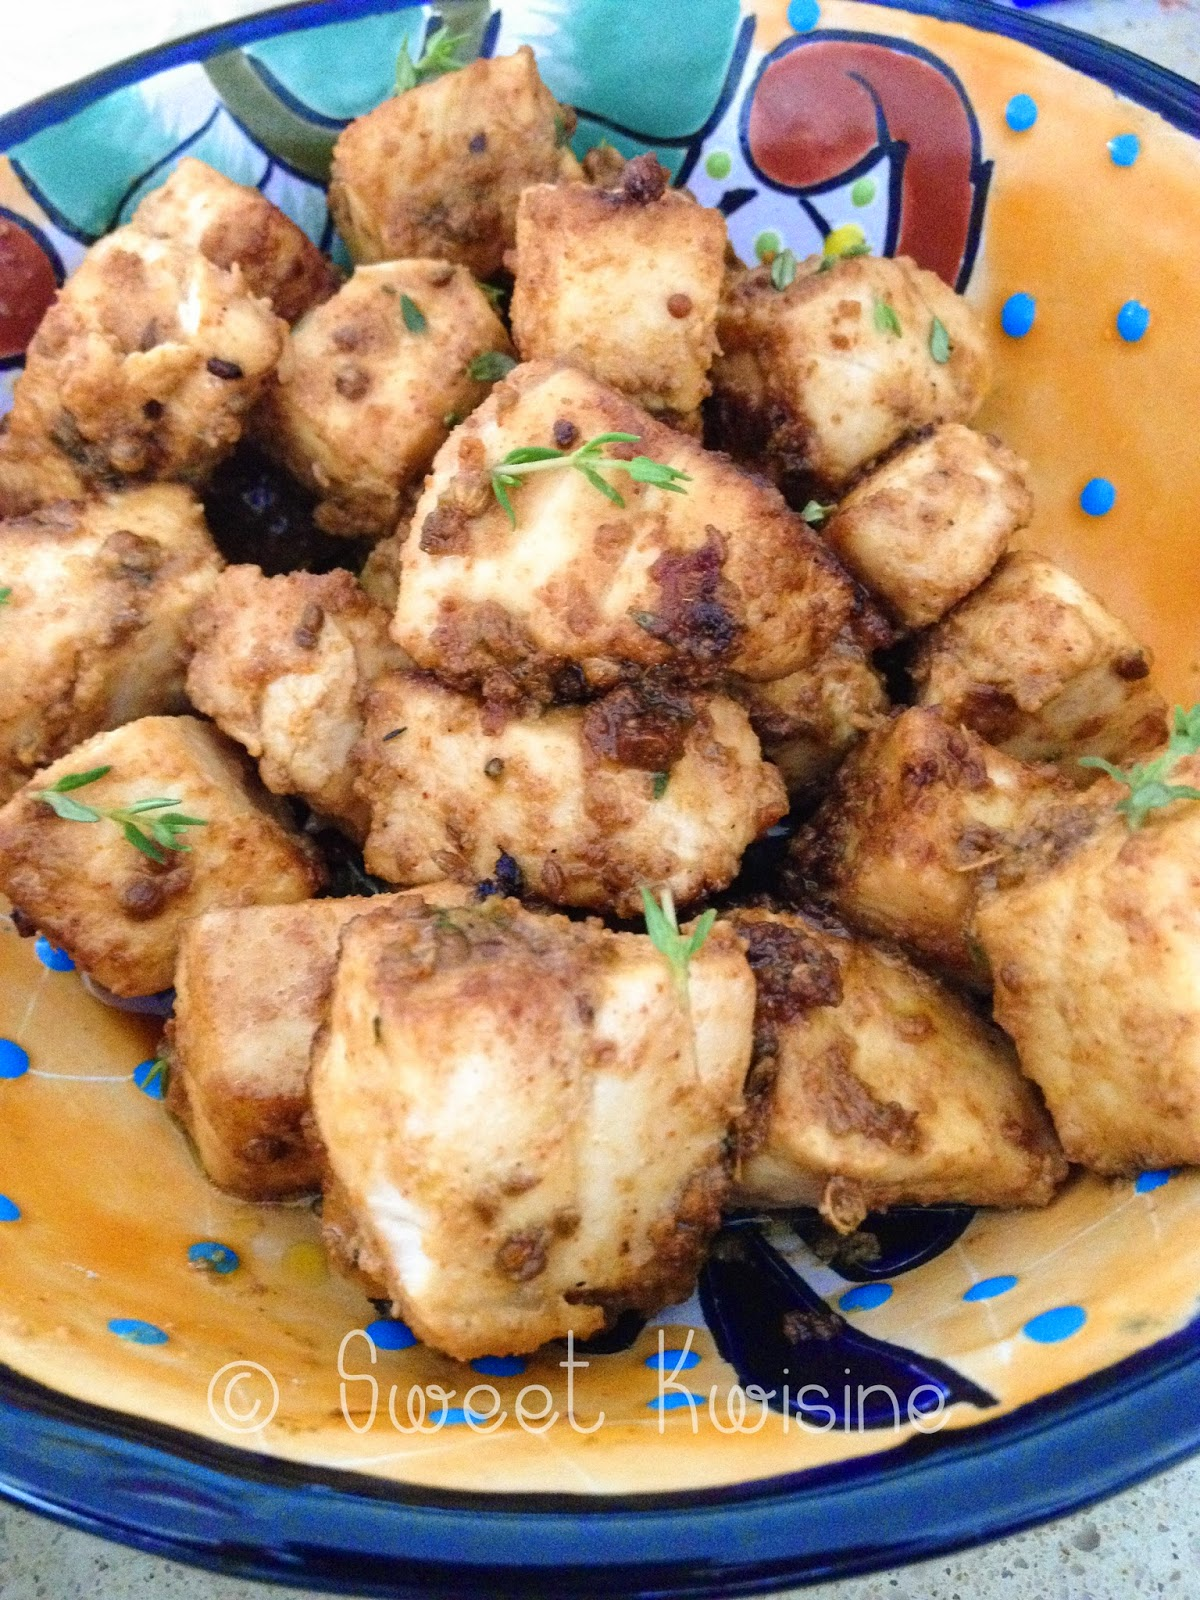 Sweet Kwisine, poivron, espadon, fish, poivron, cuisine antillaise